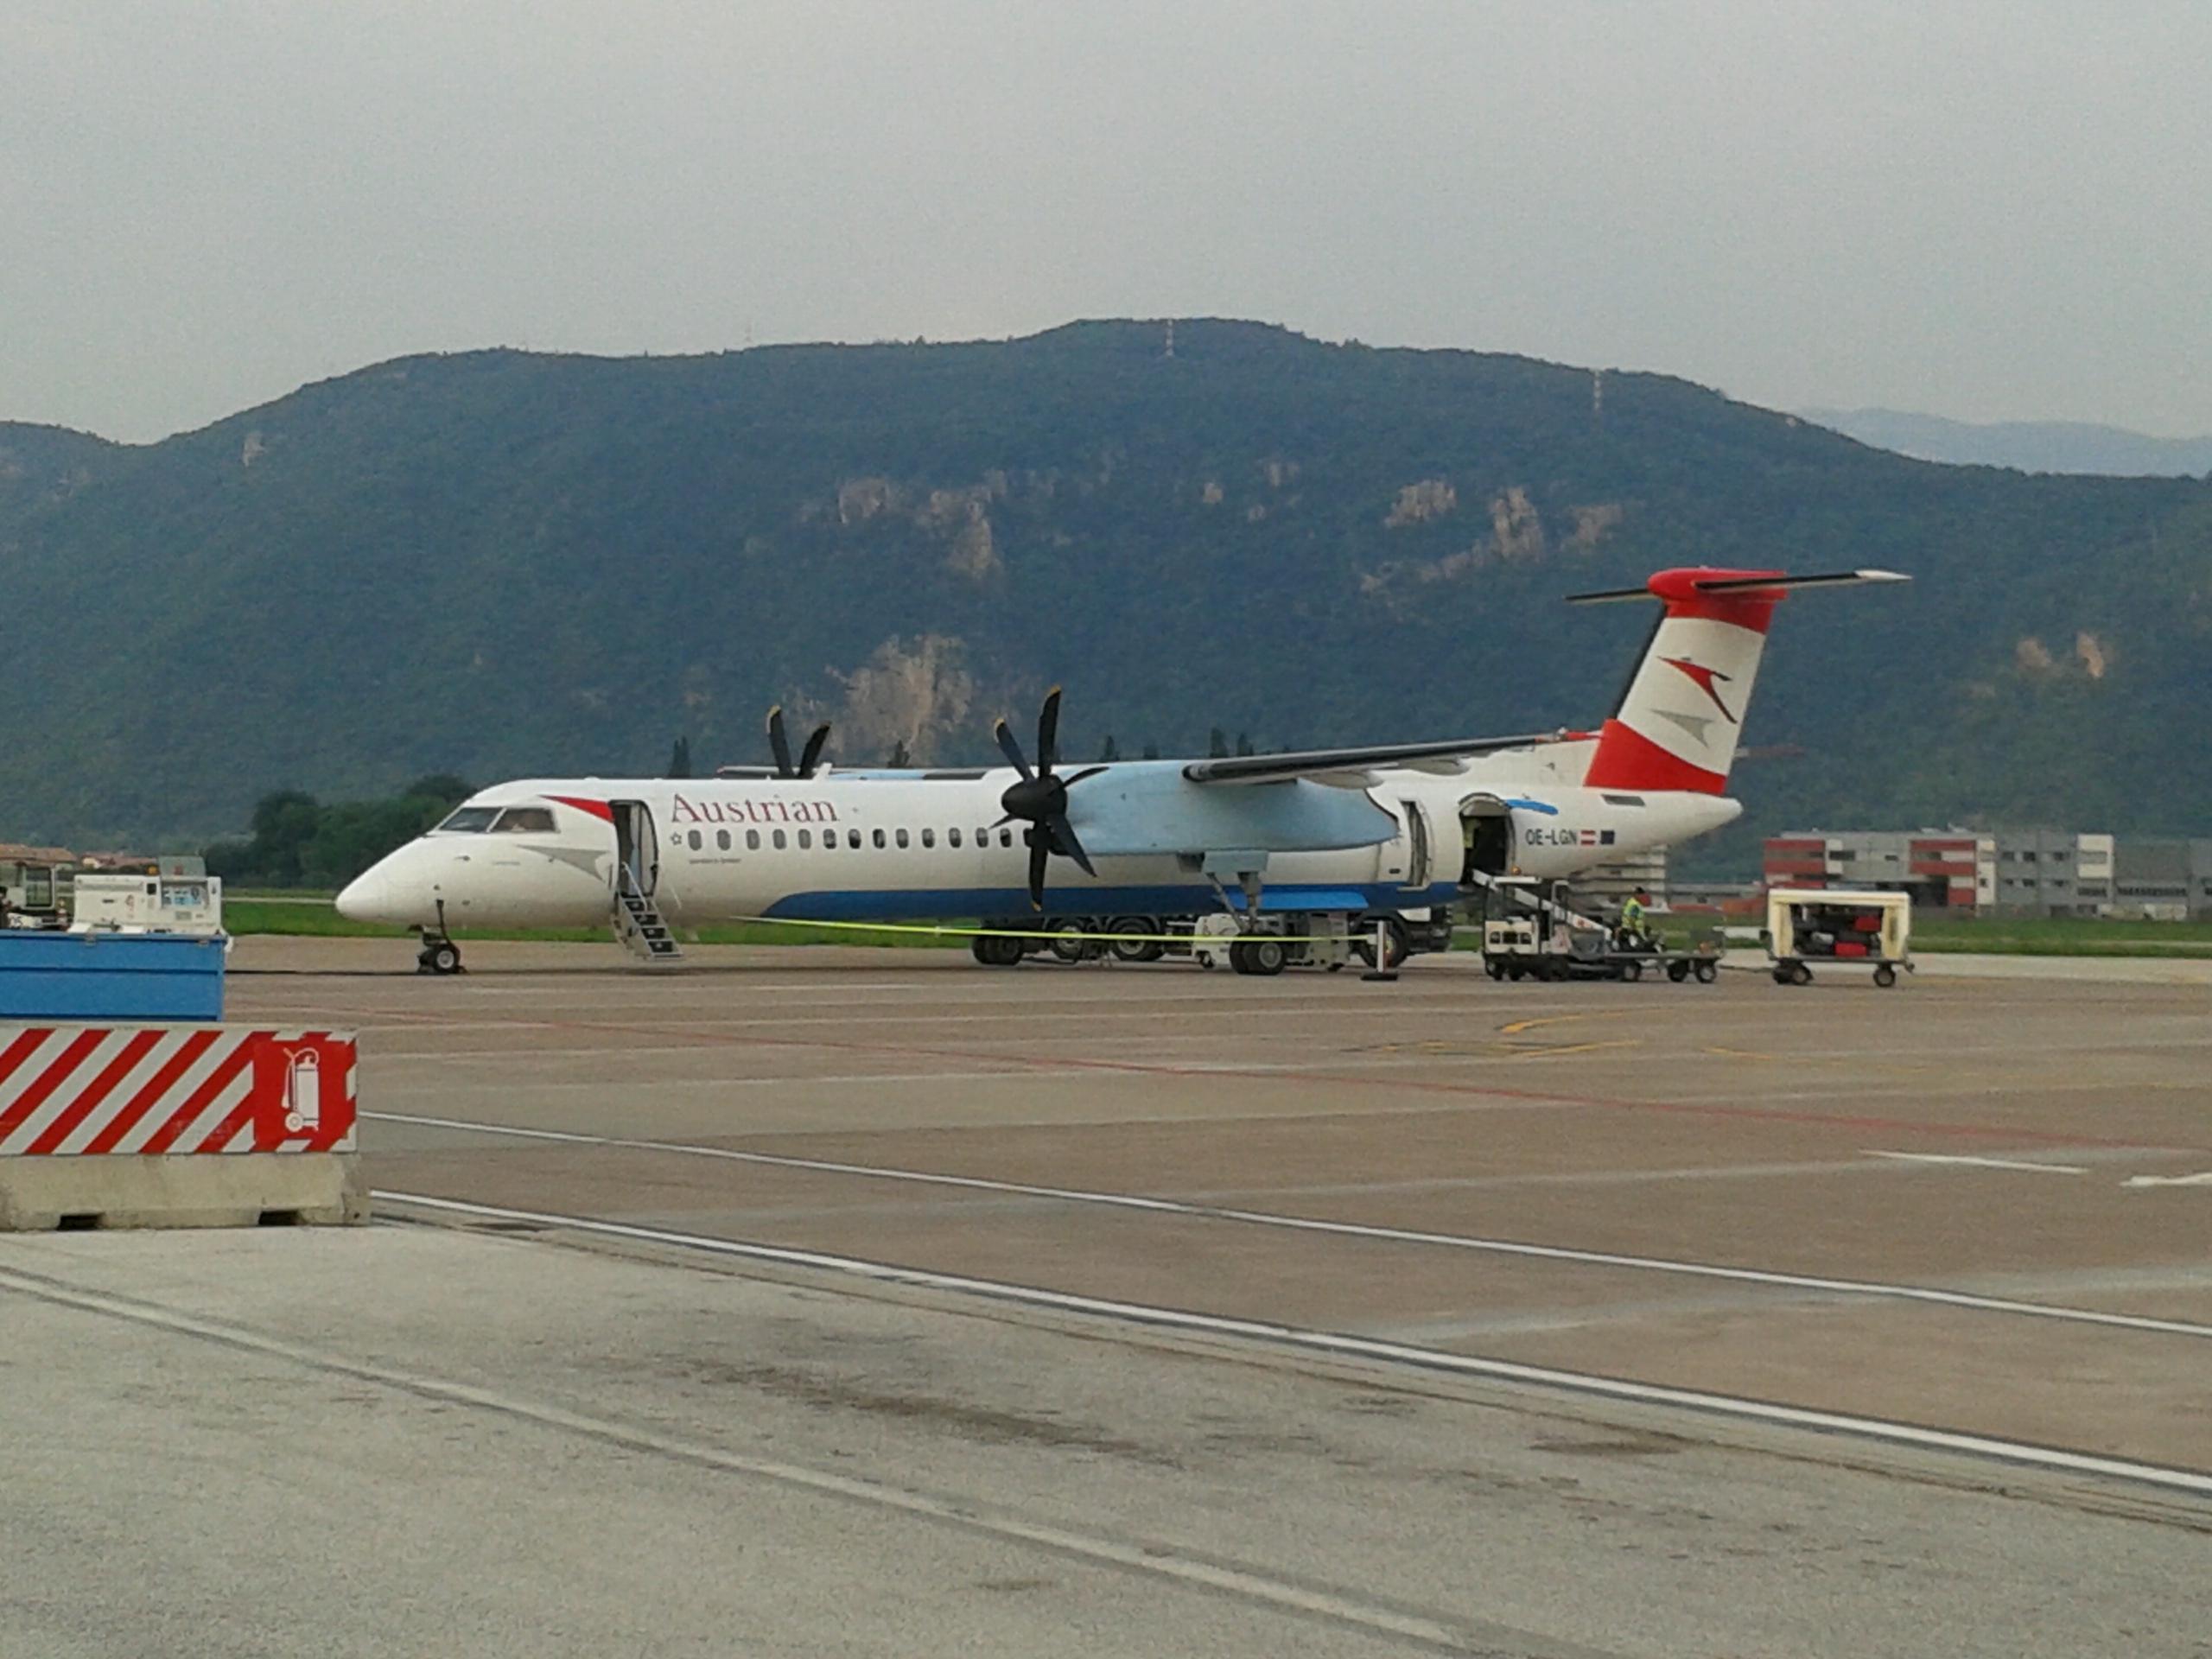 Aeroporto Trento : File austrian arrows bombardier q eg wikipedia